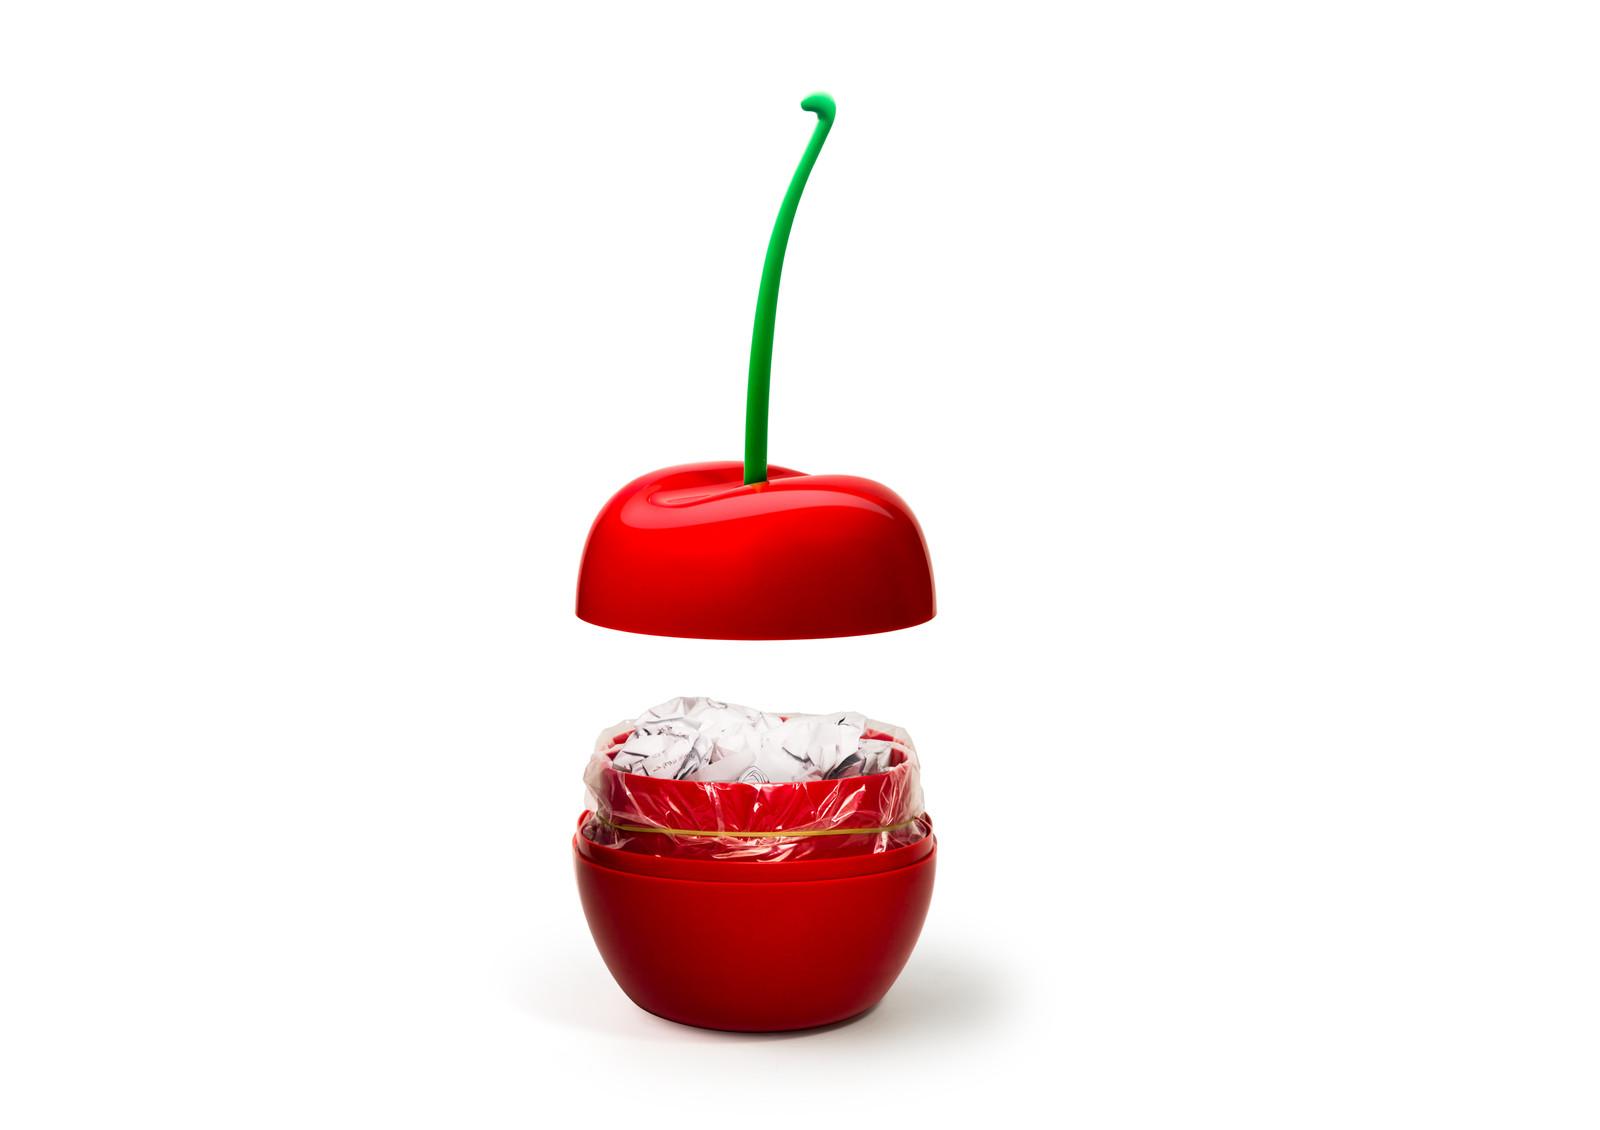 Qualy Cherry Bin image